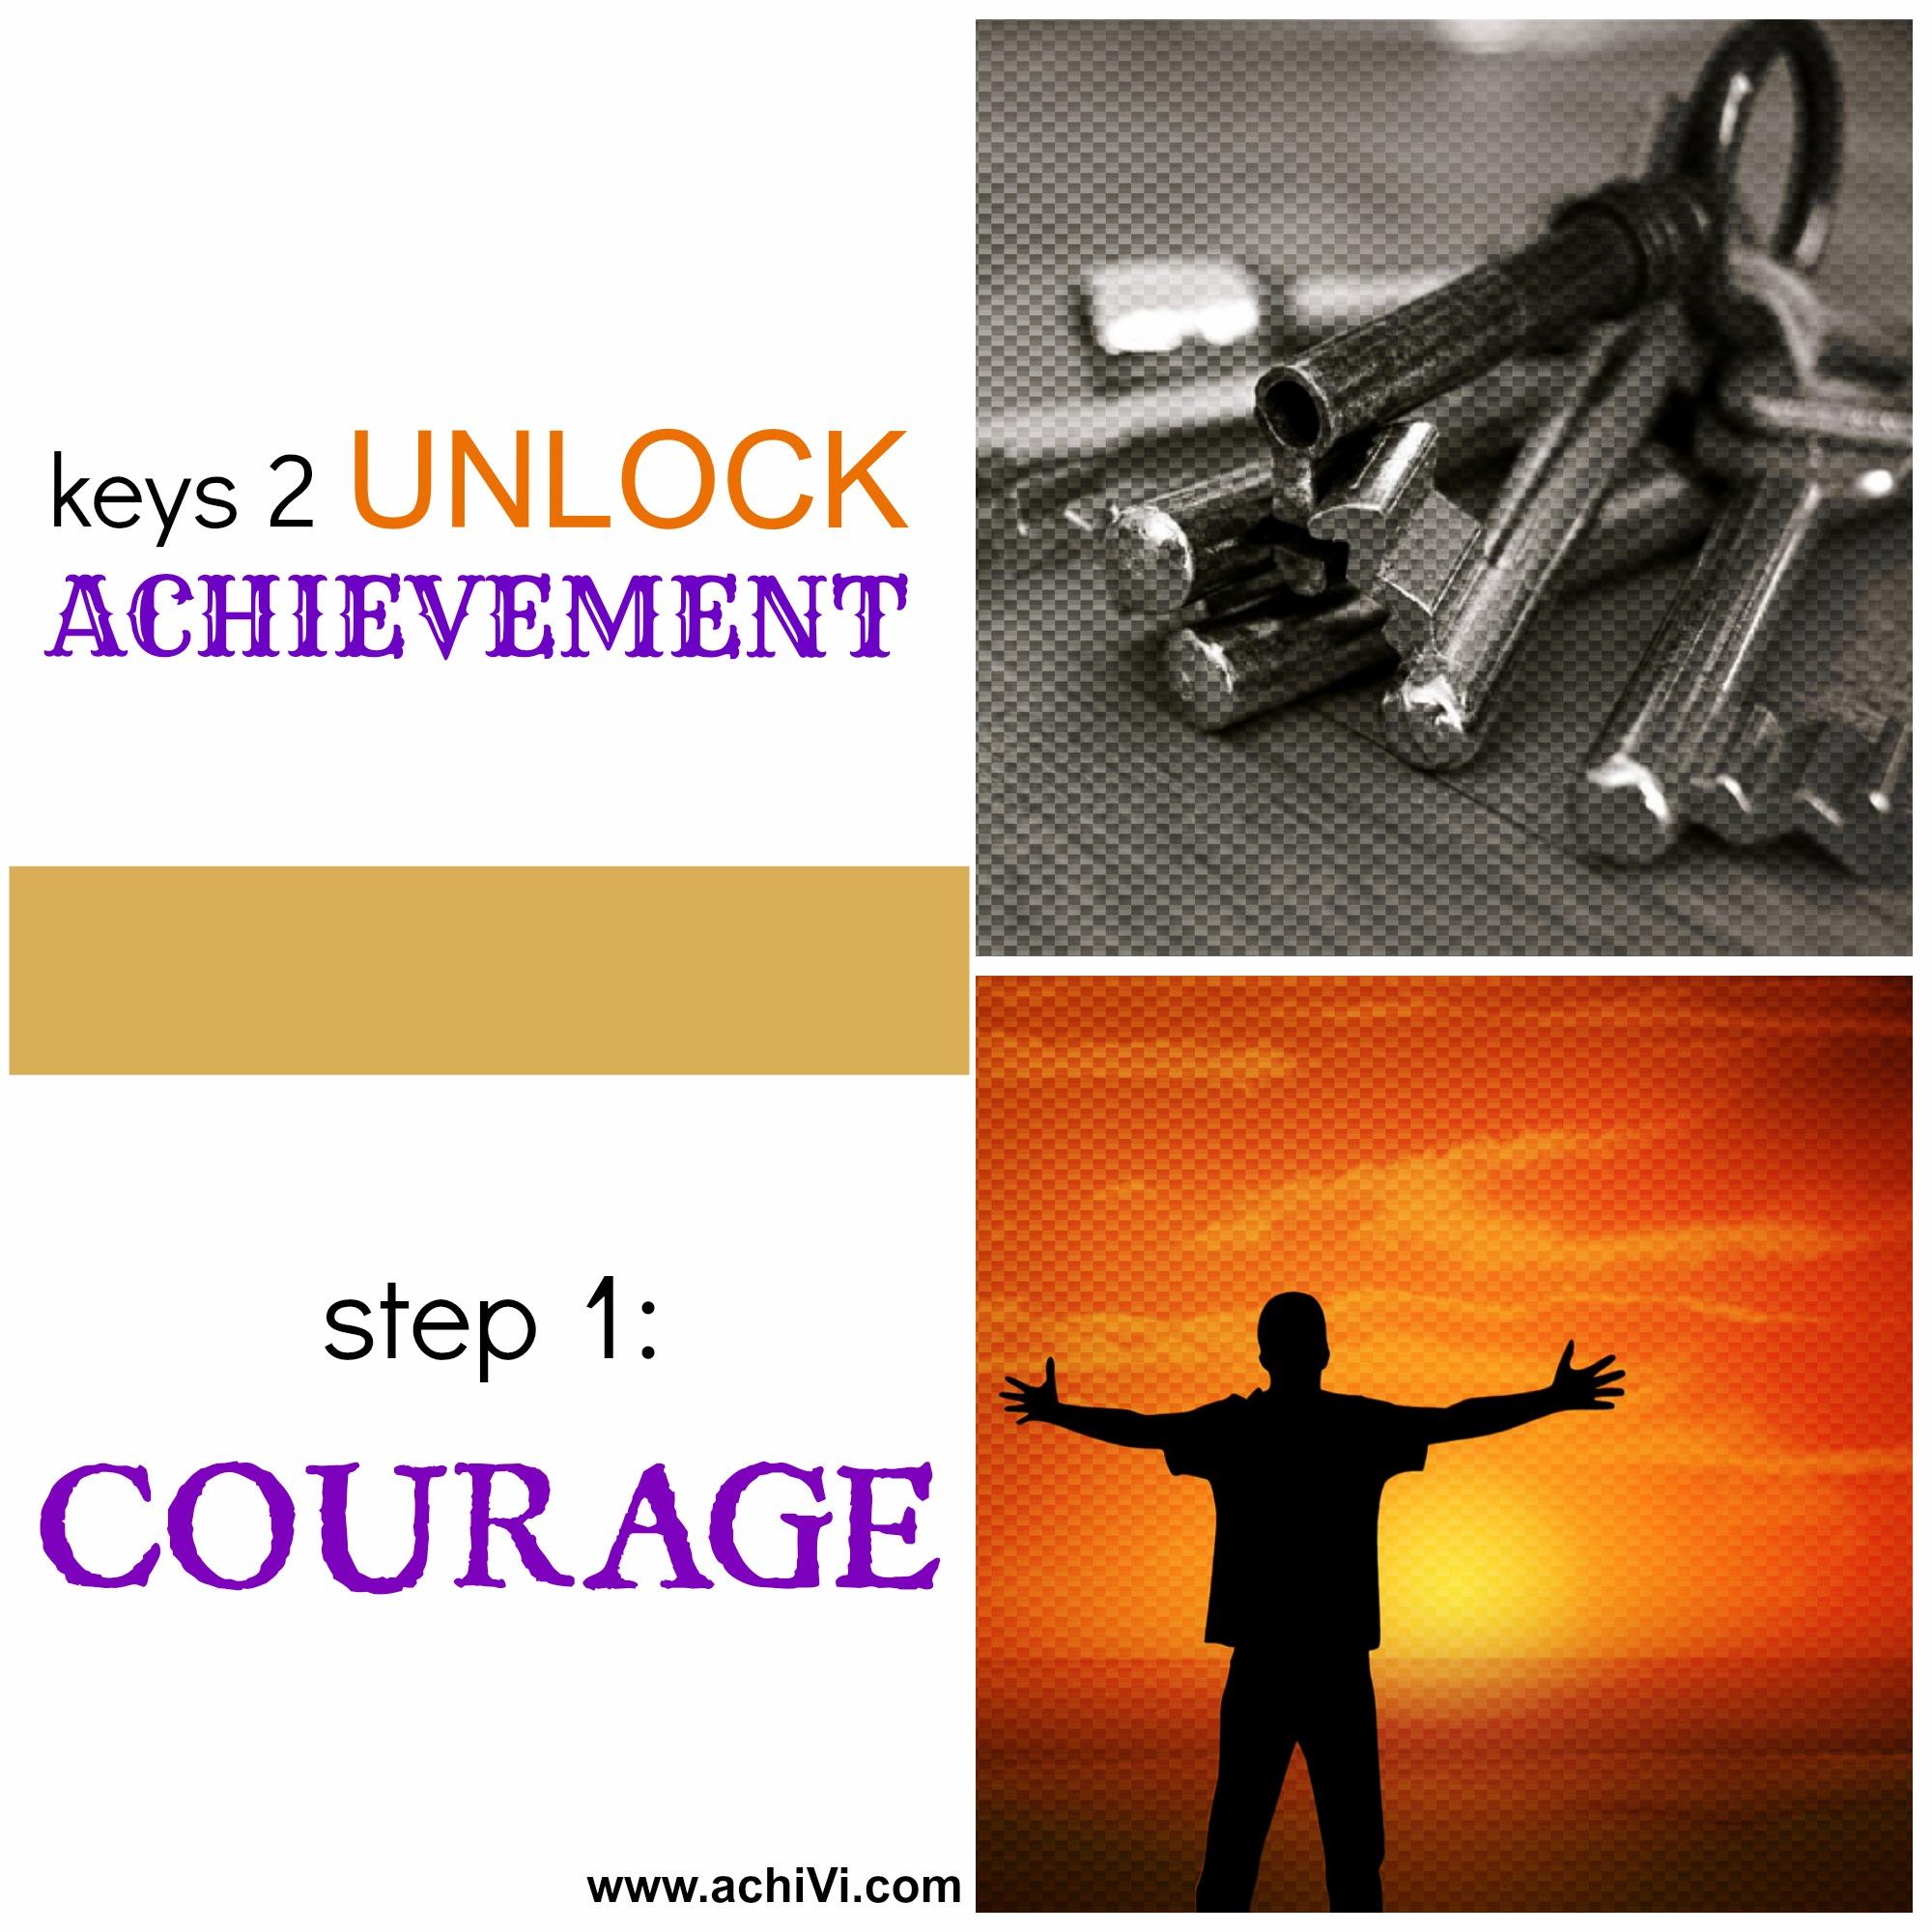 achiVi achievement key courage